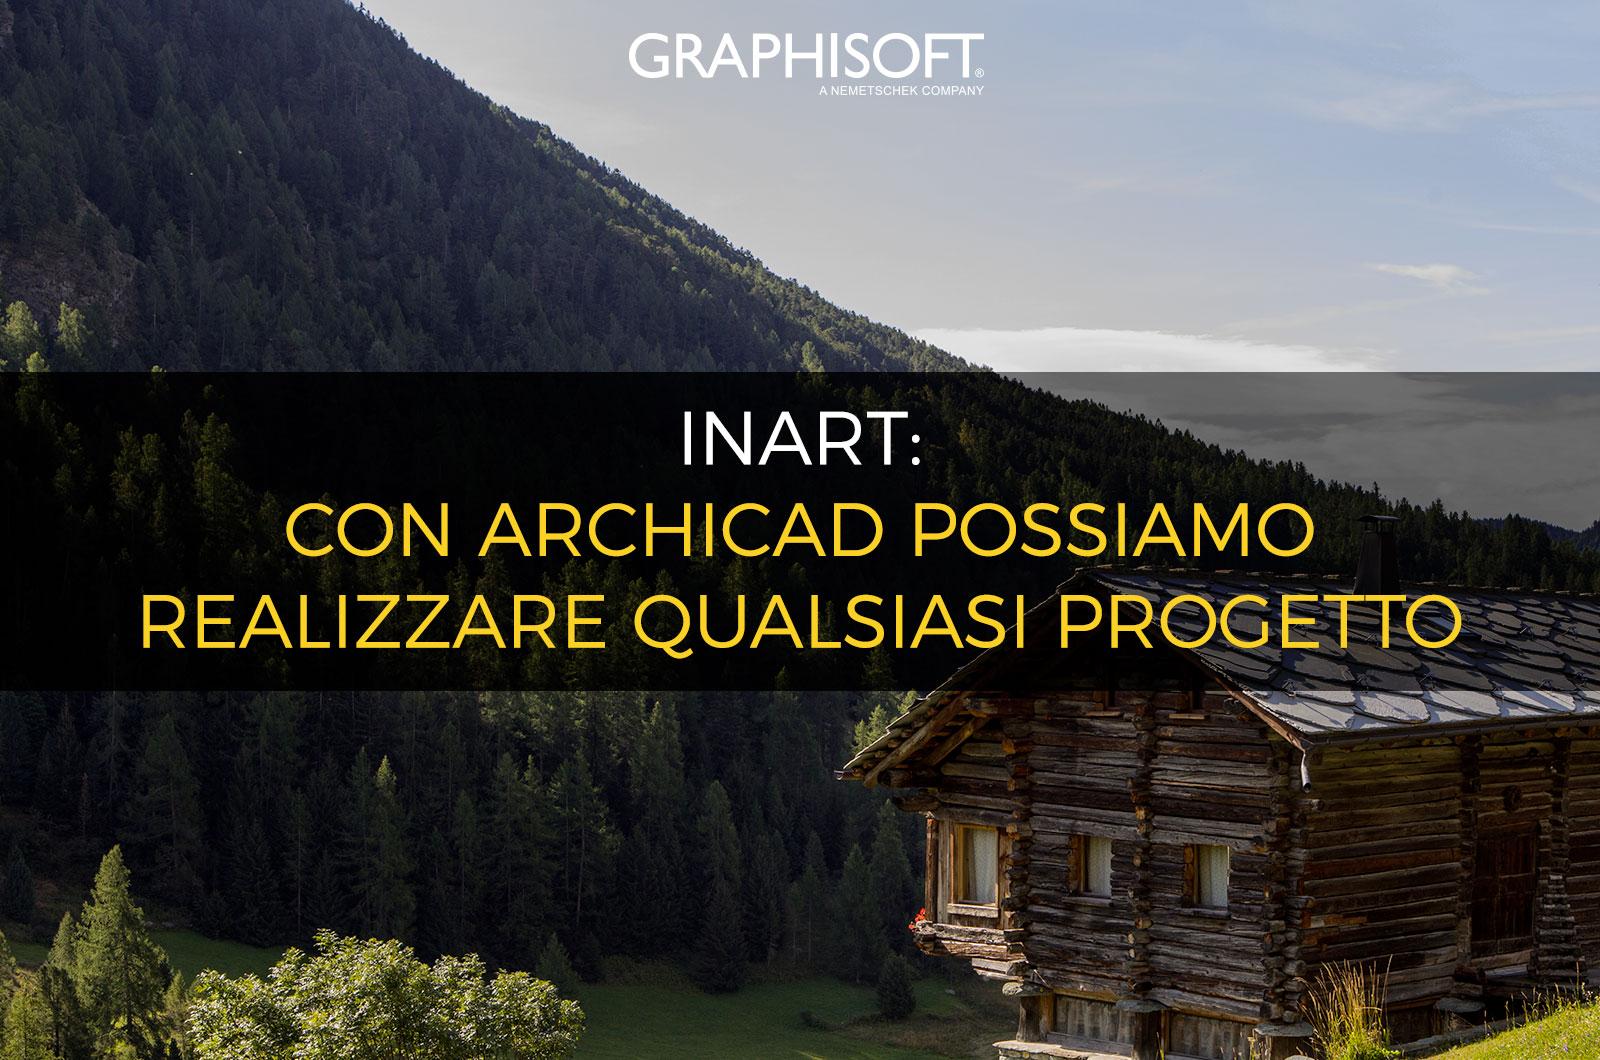 GRAPHISOFT_INART